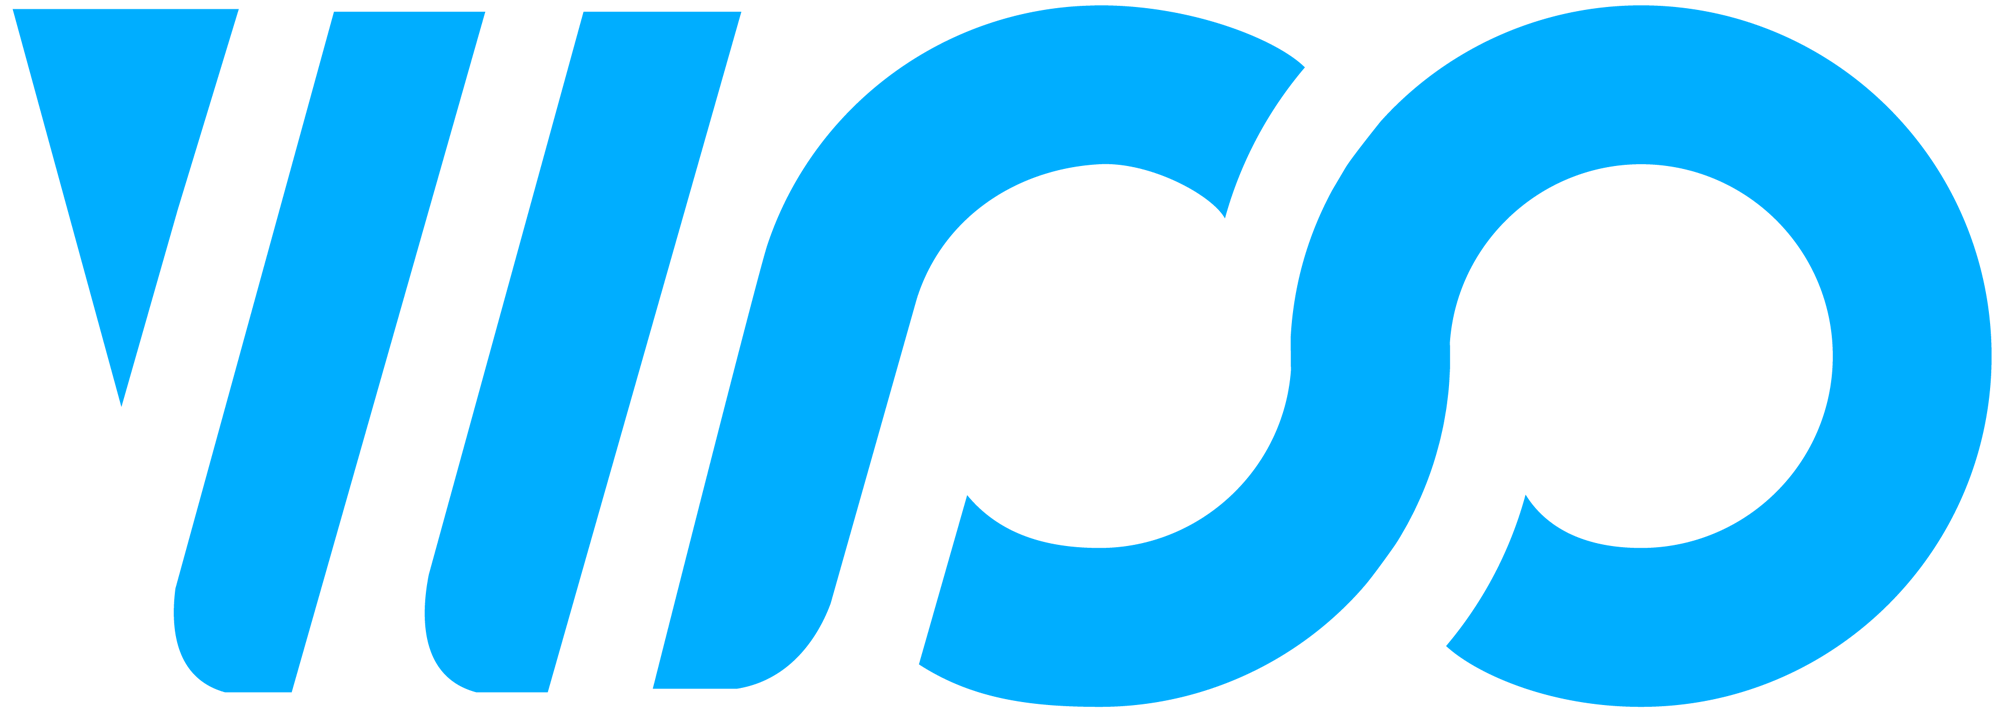 Woo Sports logo.png